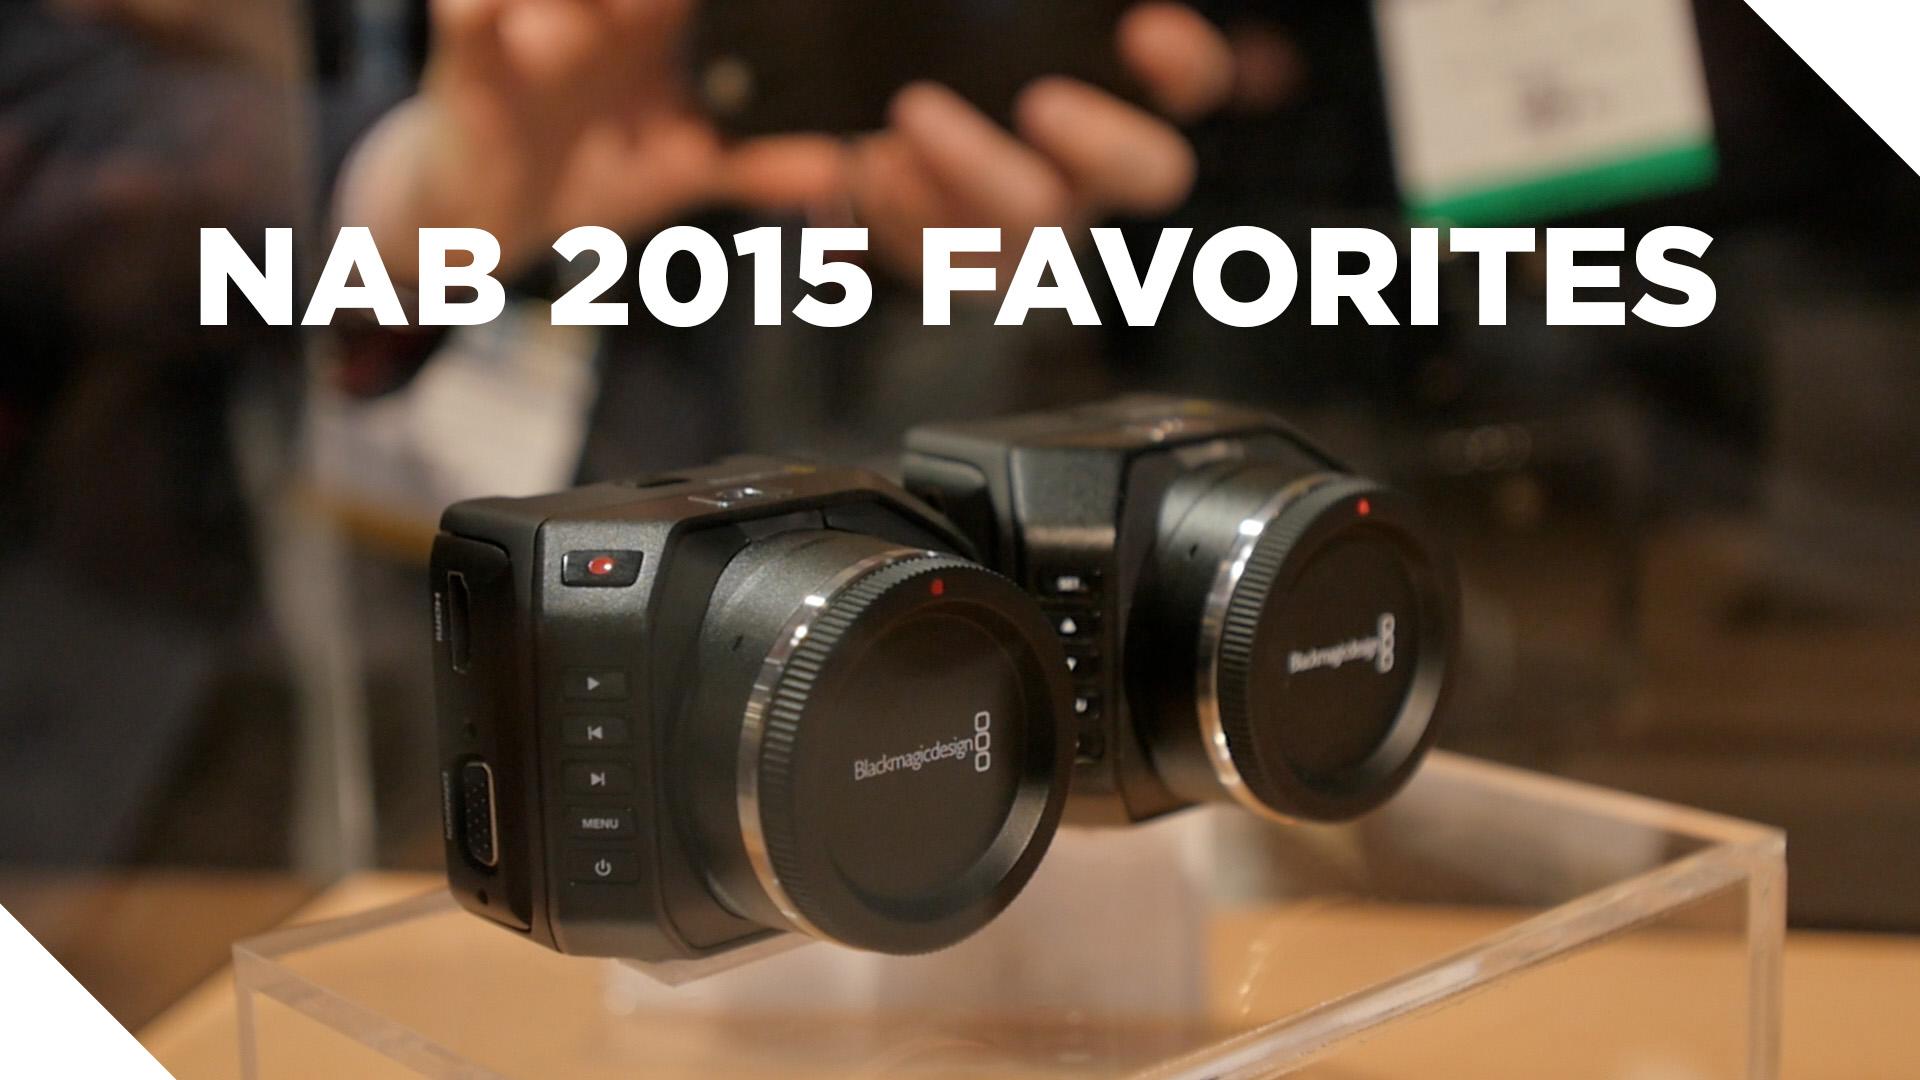 NAB 2015 Favorites